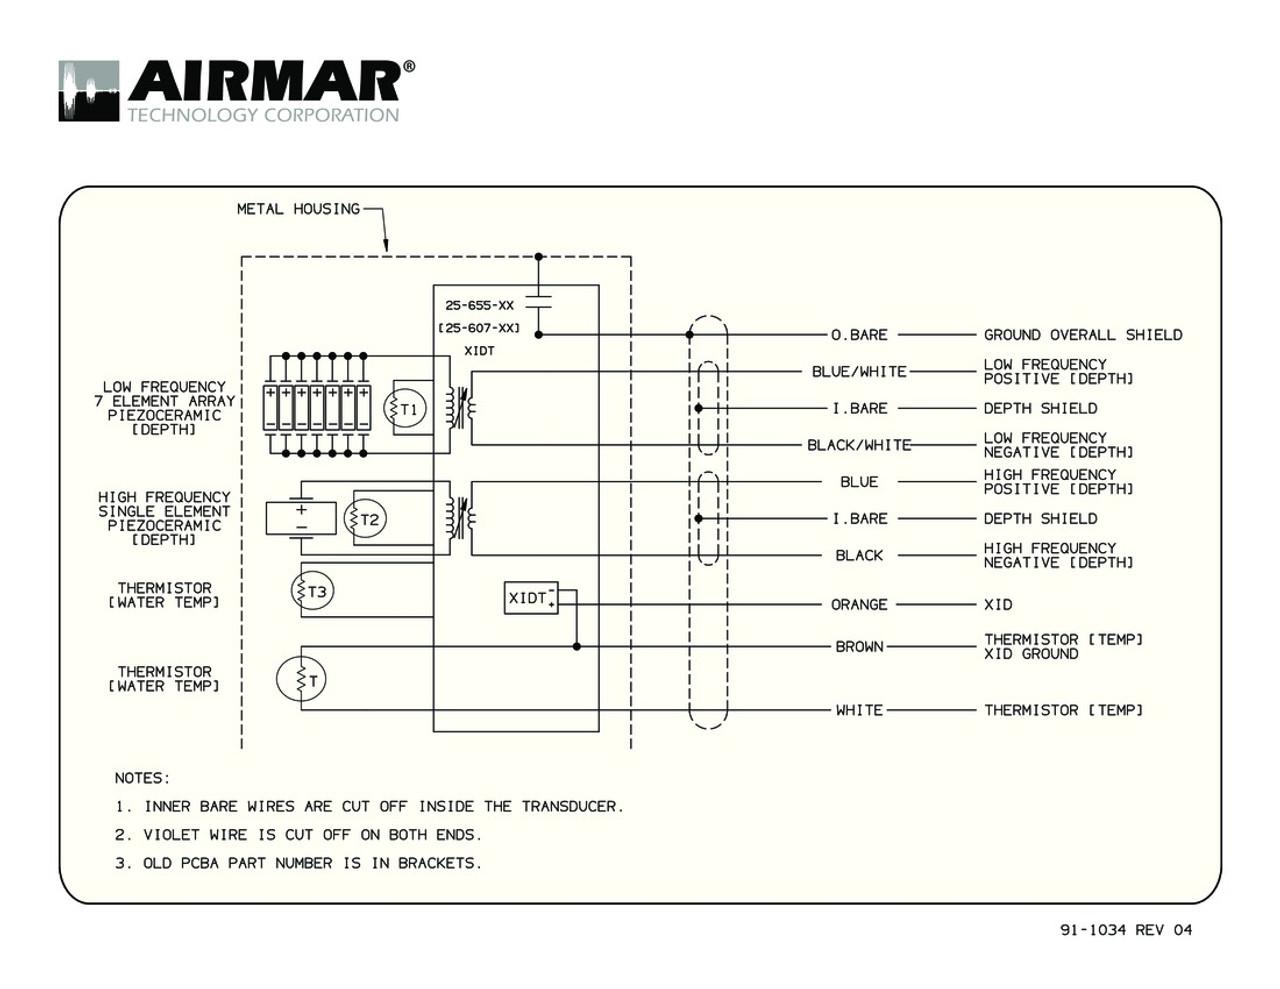 hight resolution of airmar wiring diagram b265 b275 blue bottle marine pressure transducer wiring diagram b265c lh